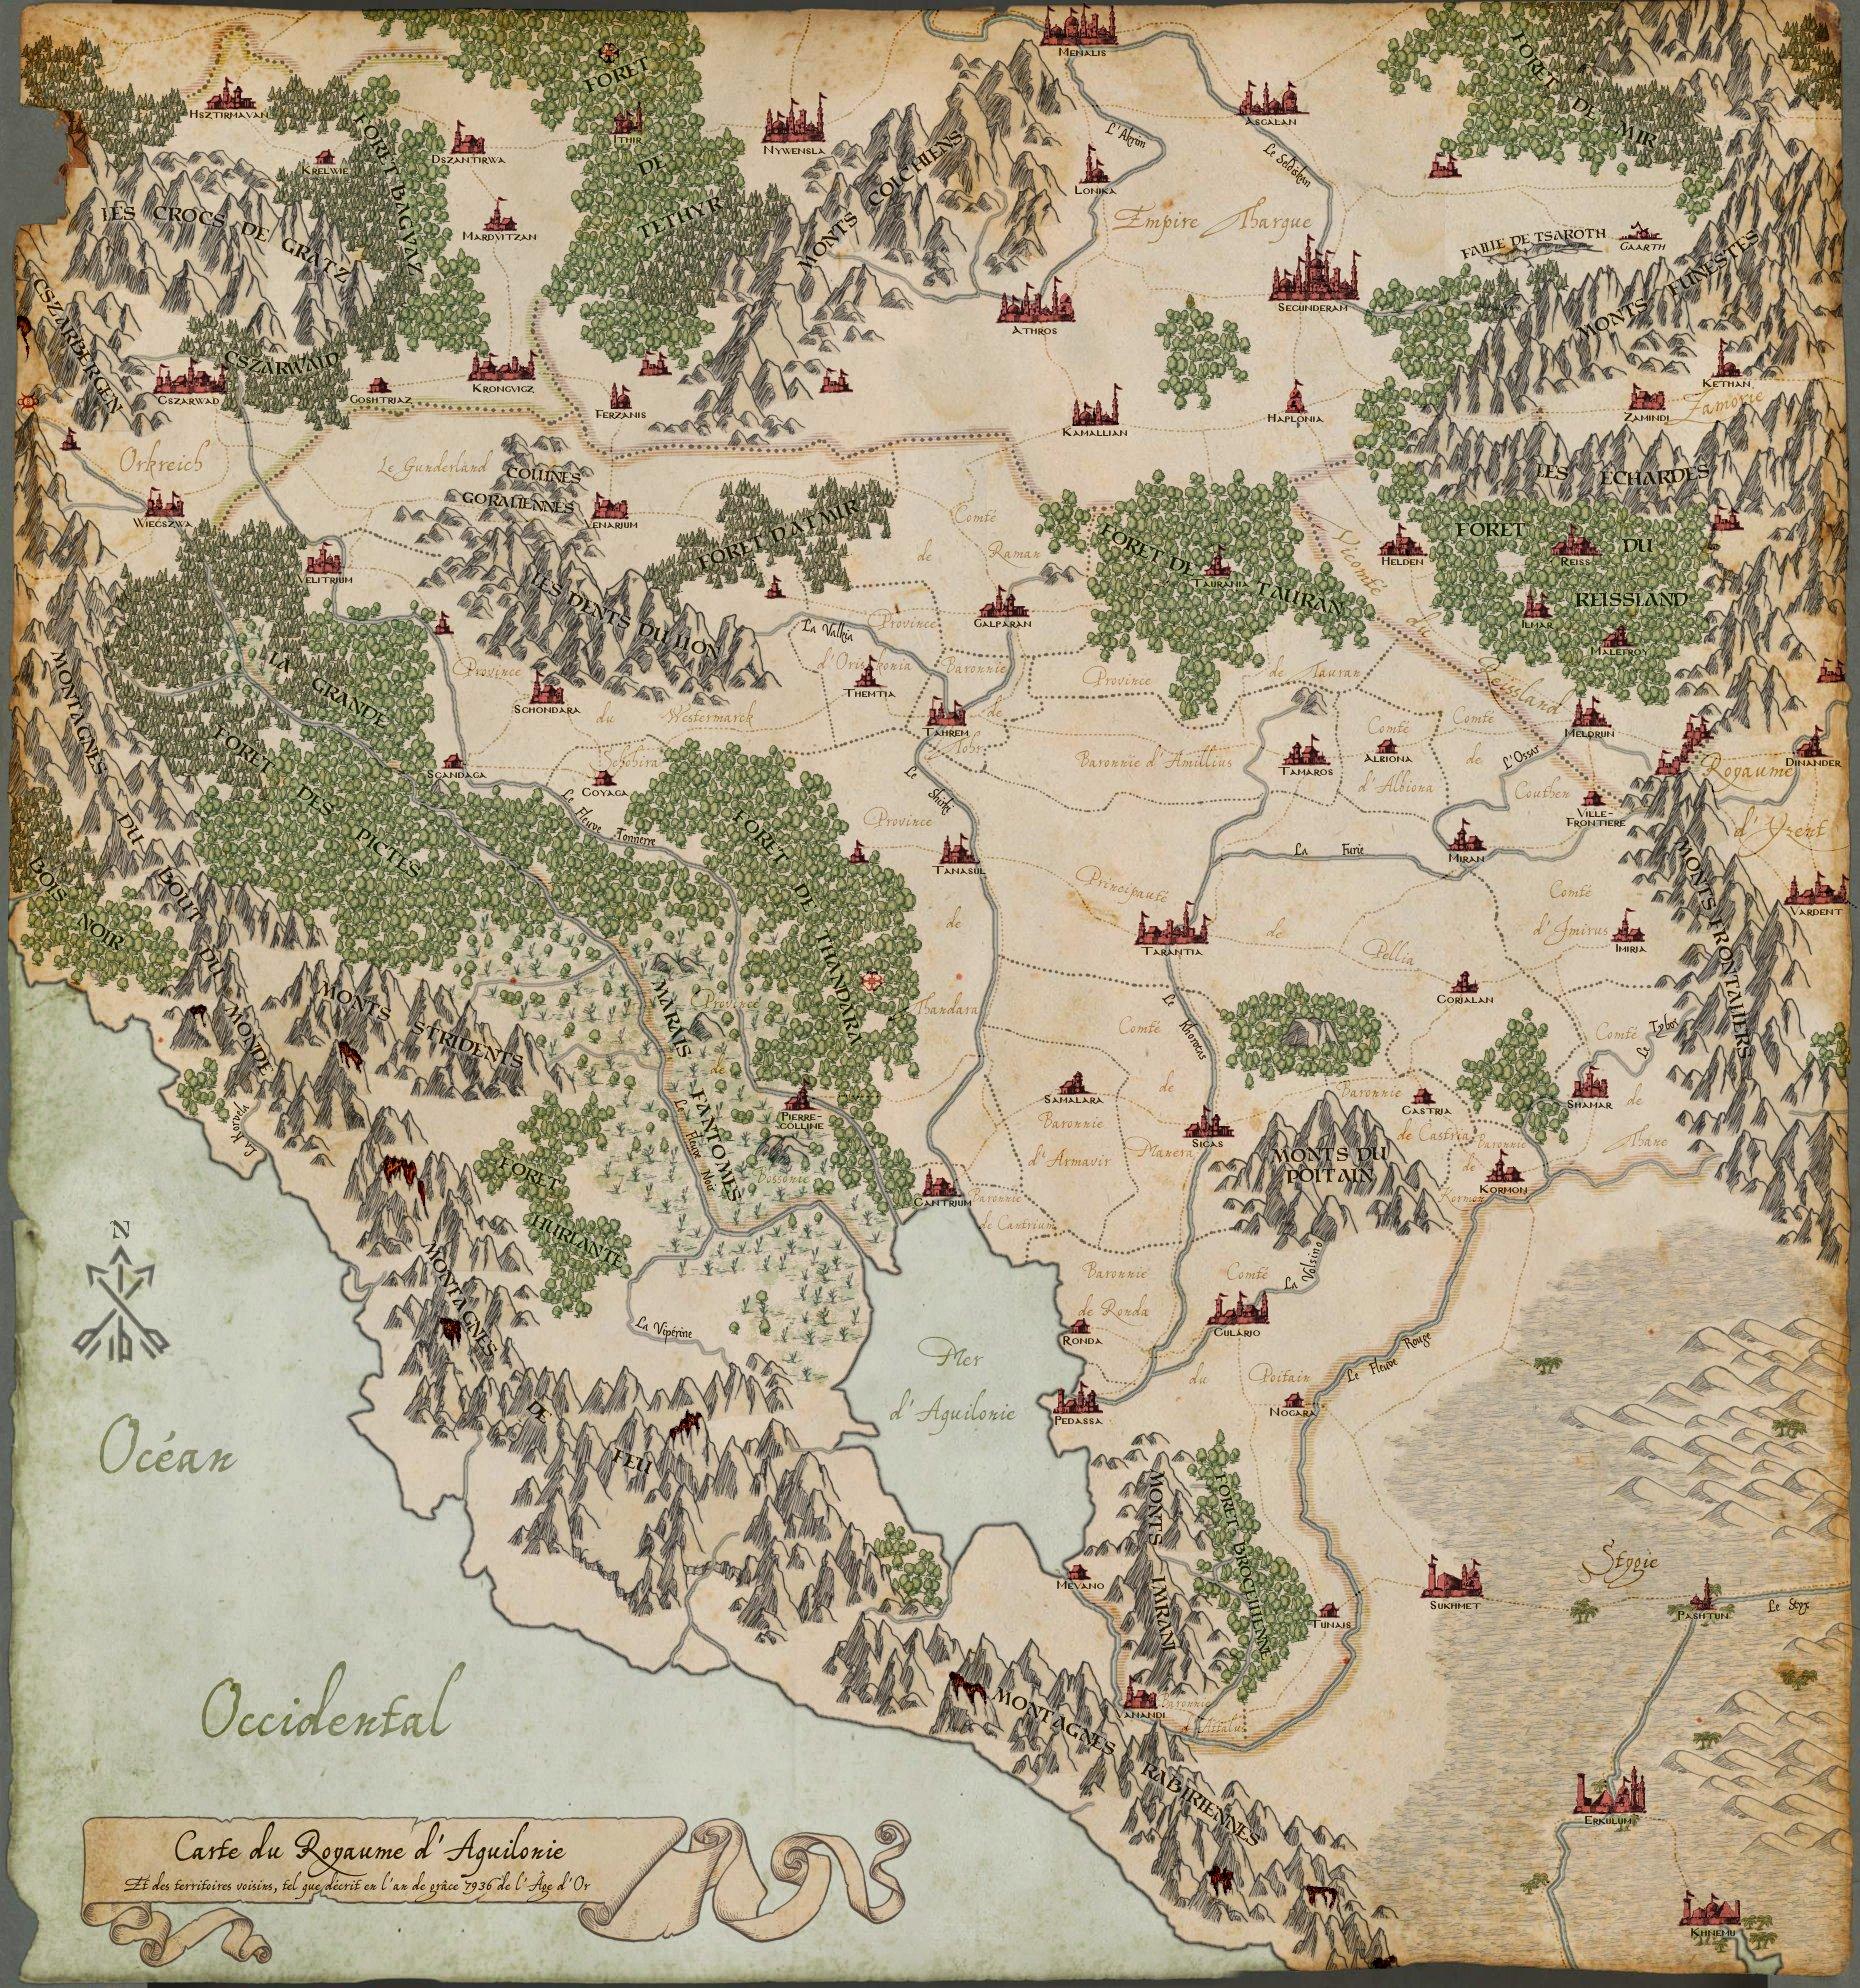 Kingdom of Aquilonia